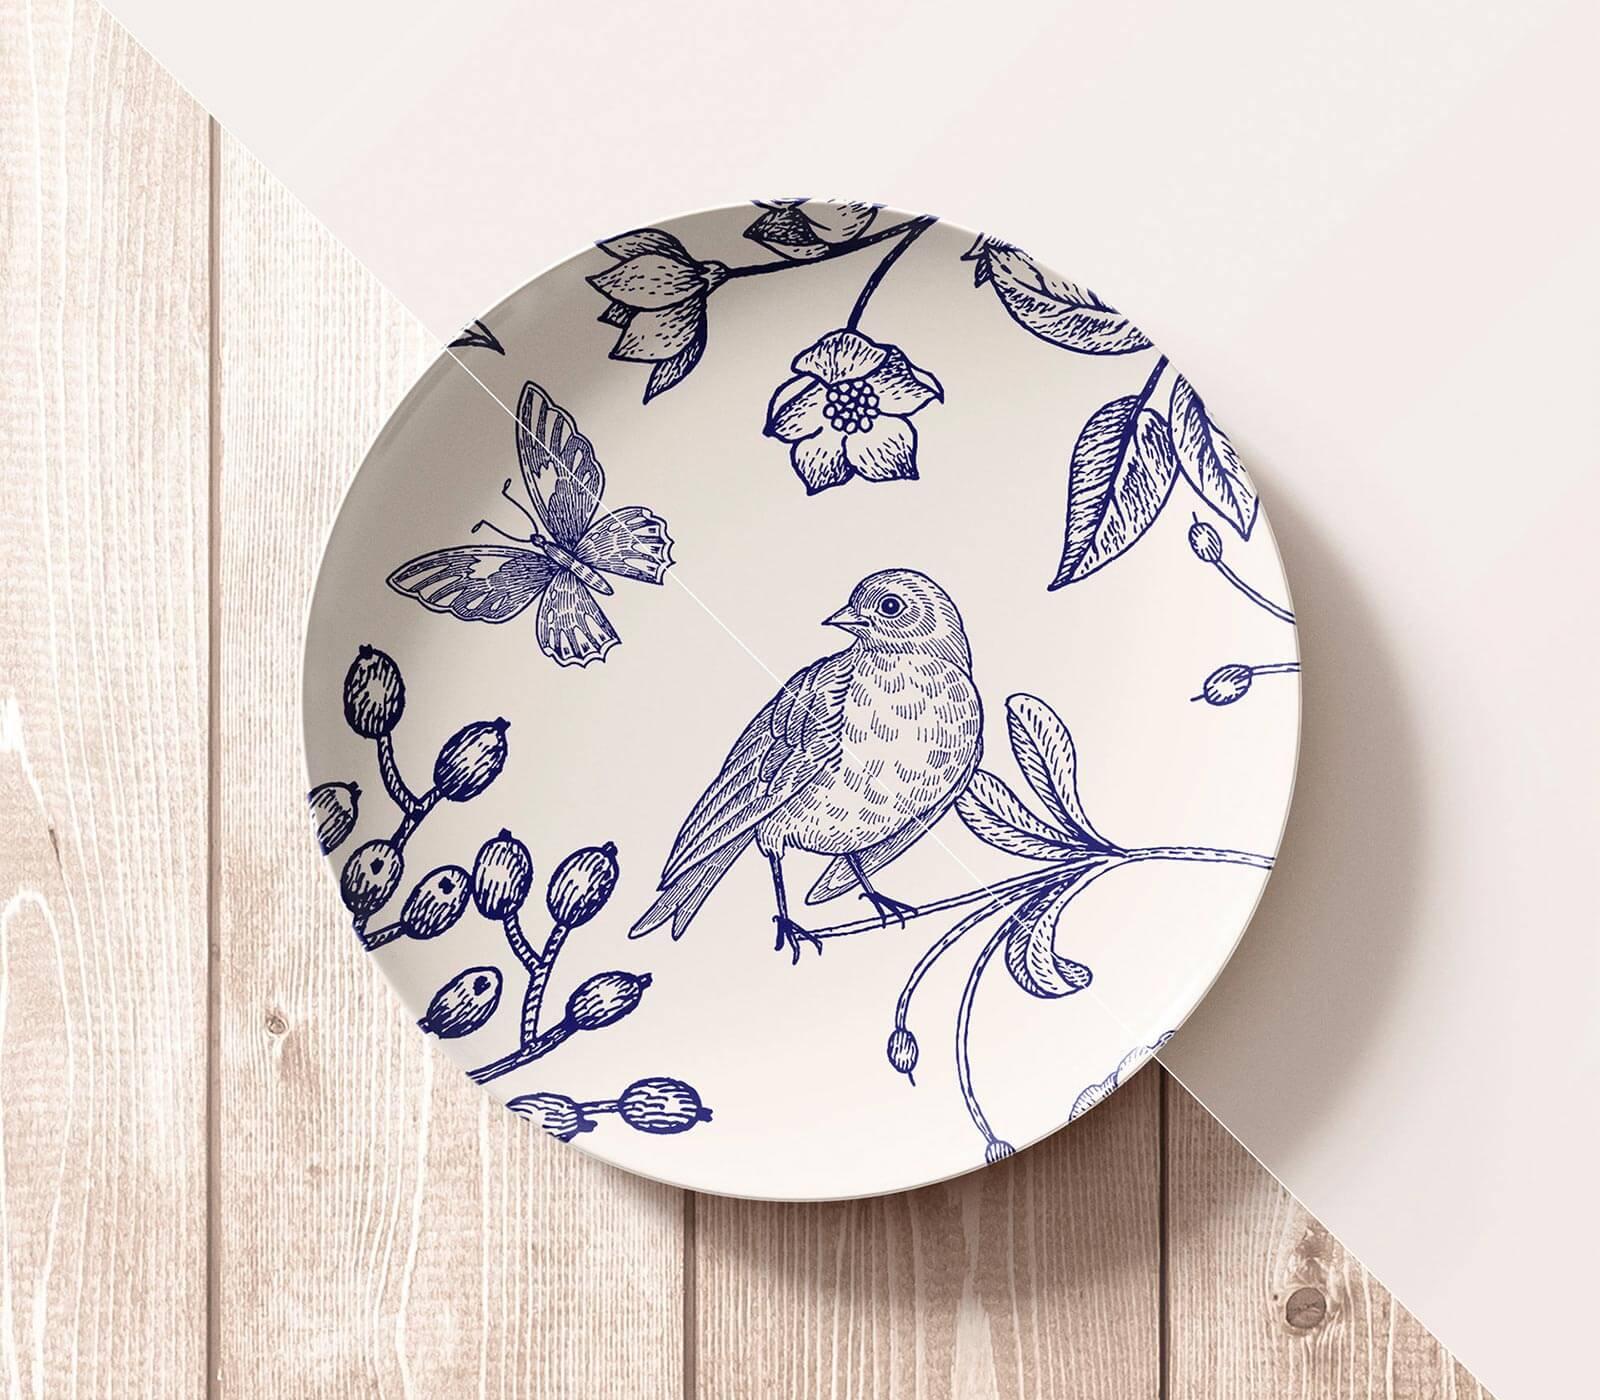 Free-Crockery-Ceramic-Plate-Mockup-PSD